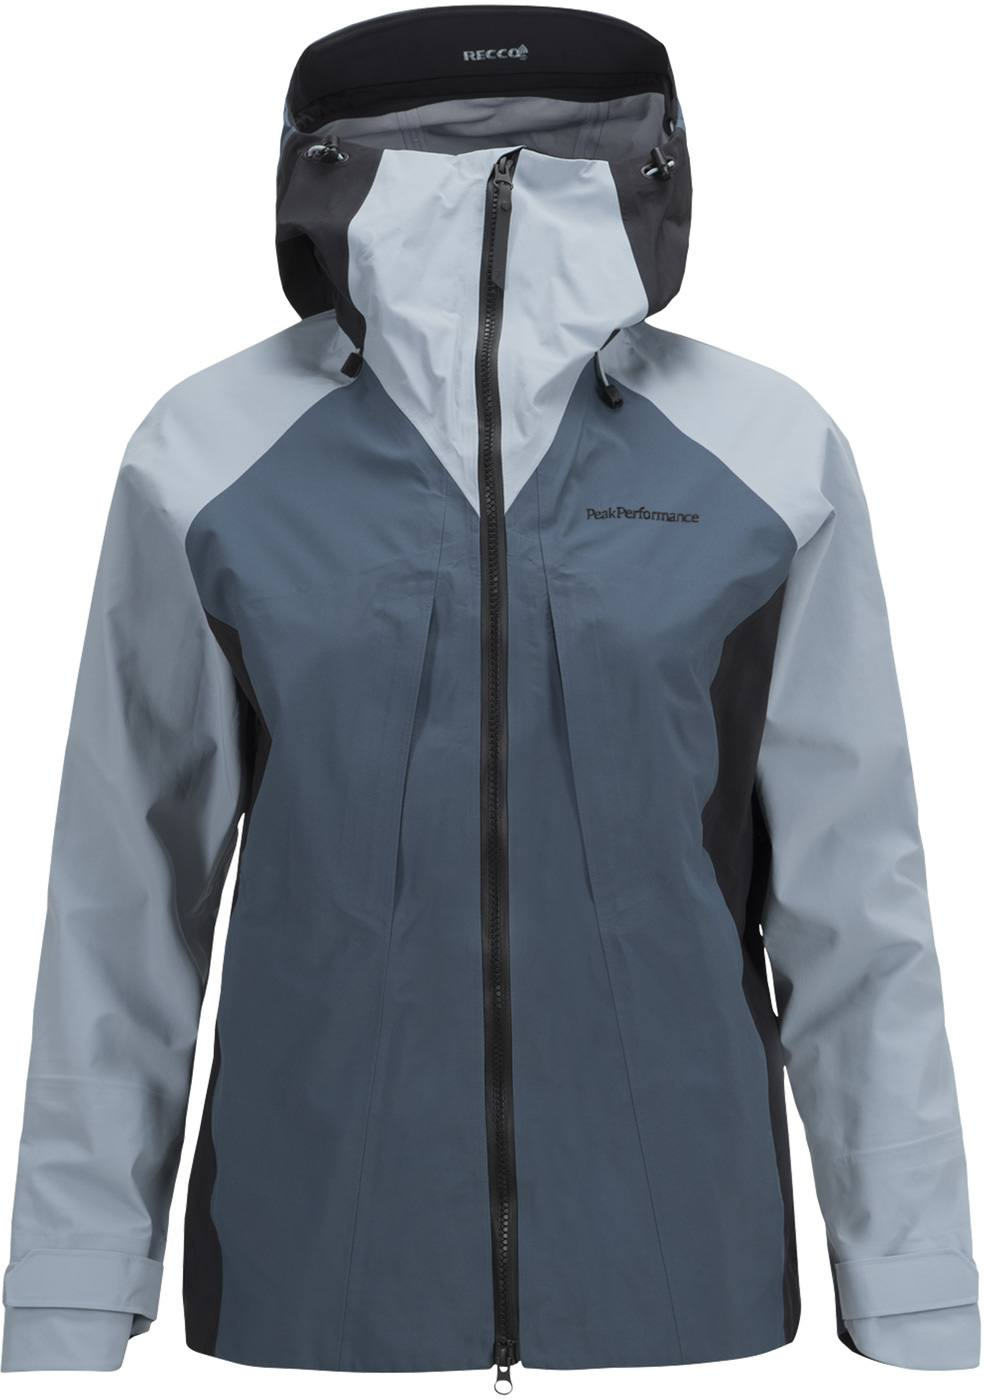 new arrival be330 b1d0a Peak Performance Women's Teton Ski Jacket